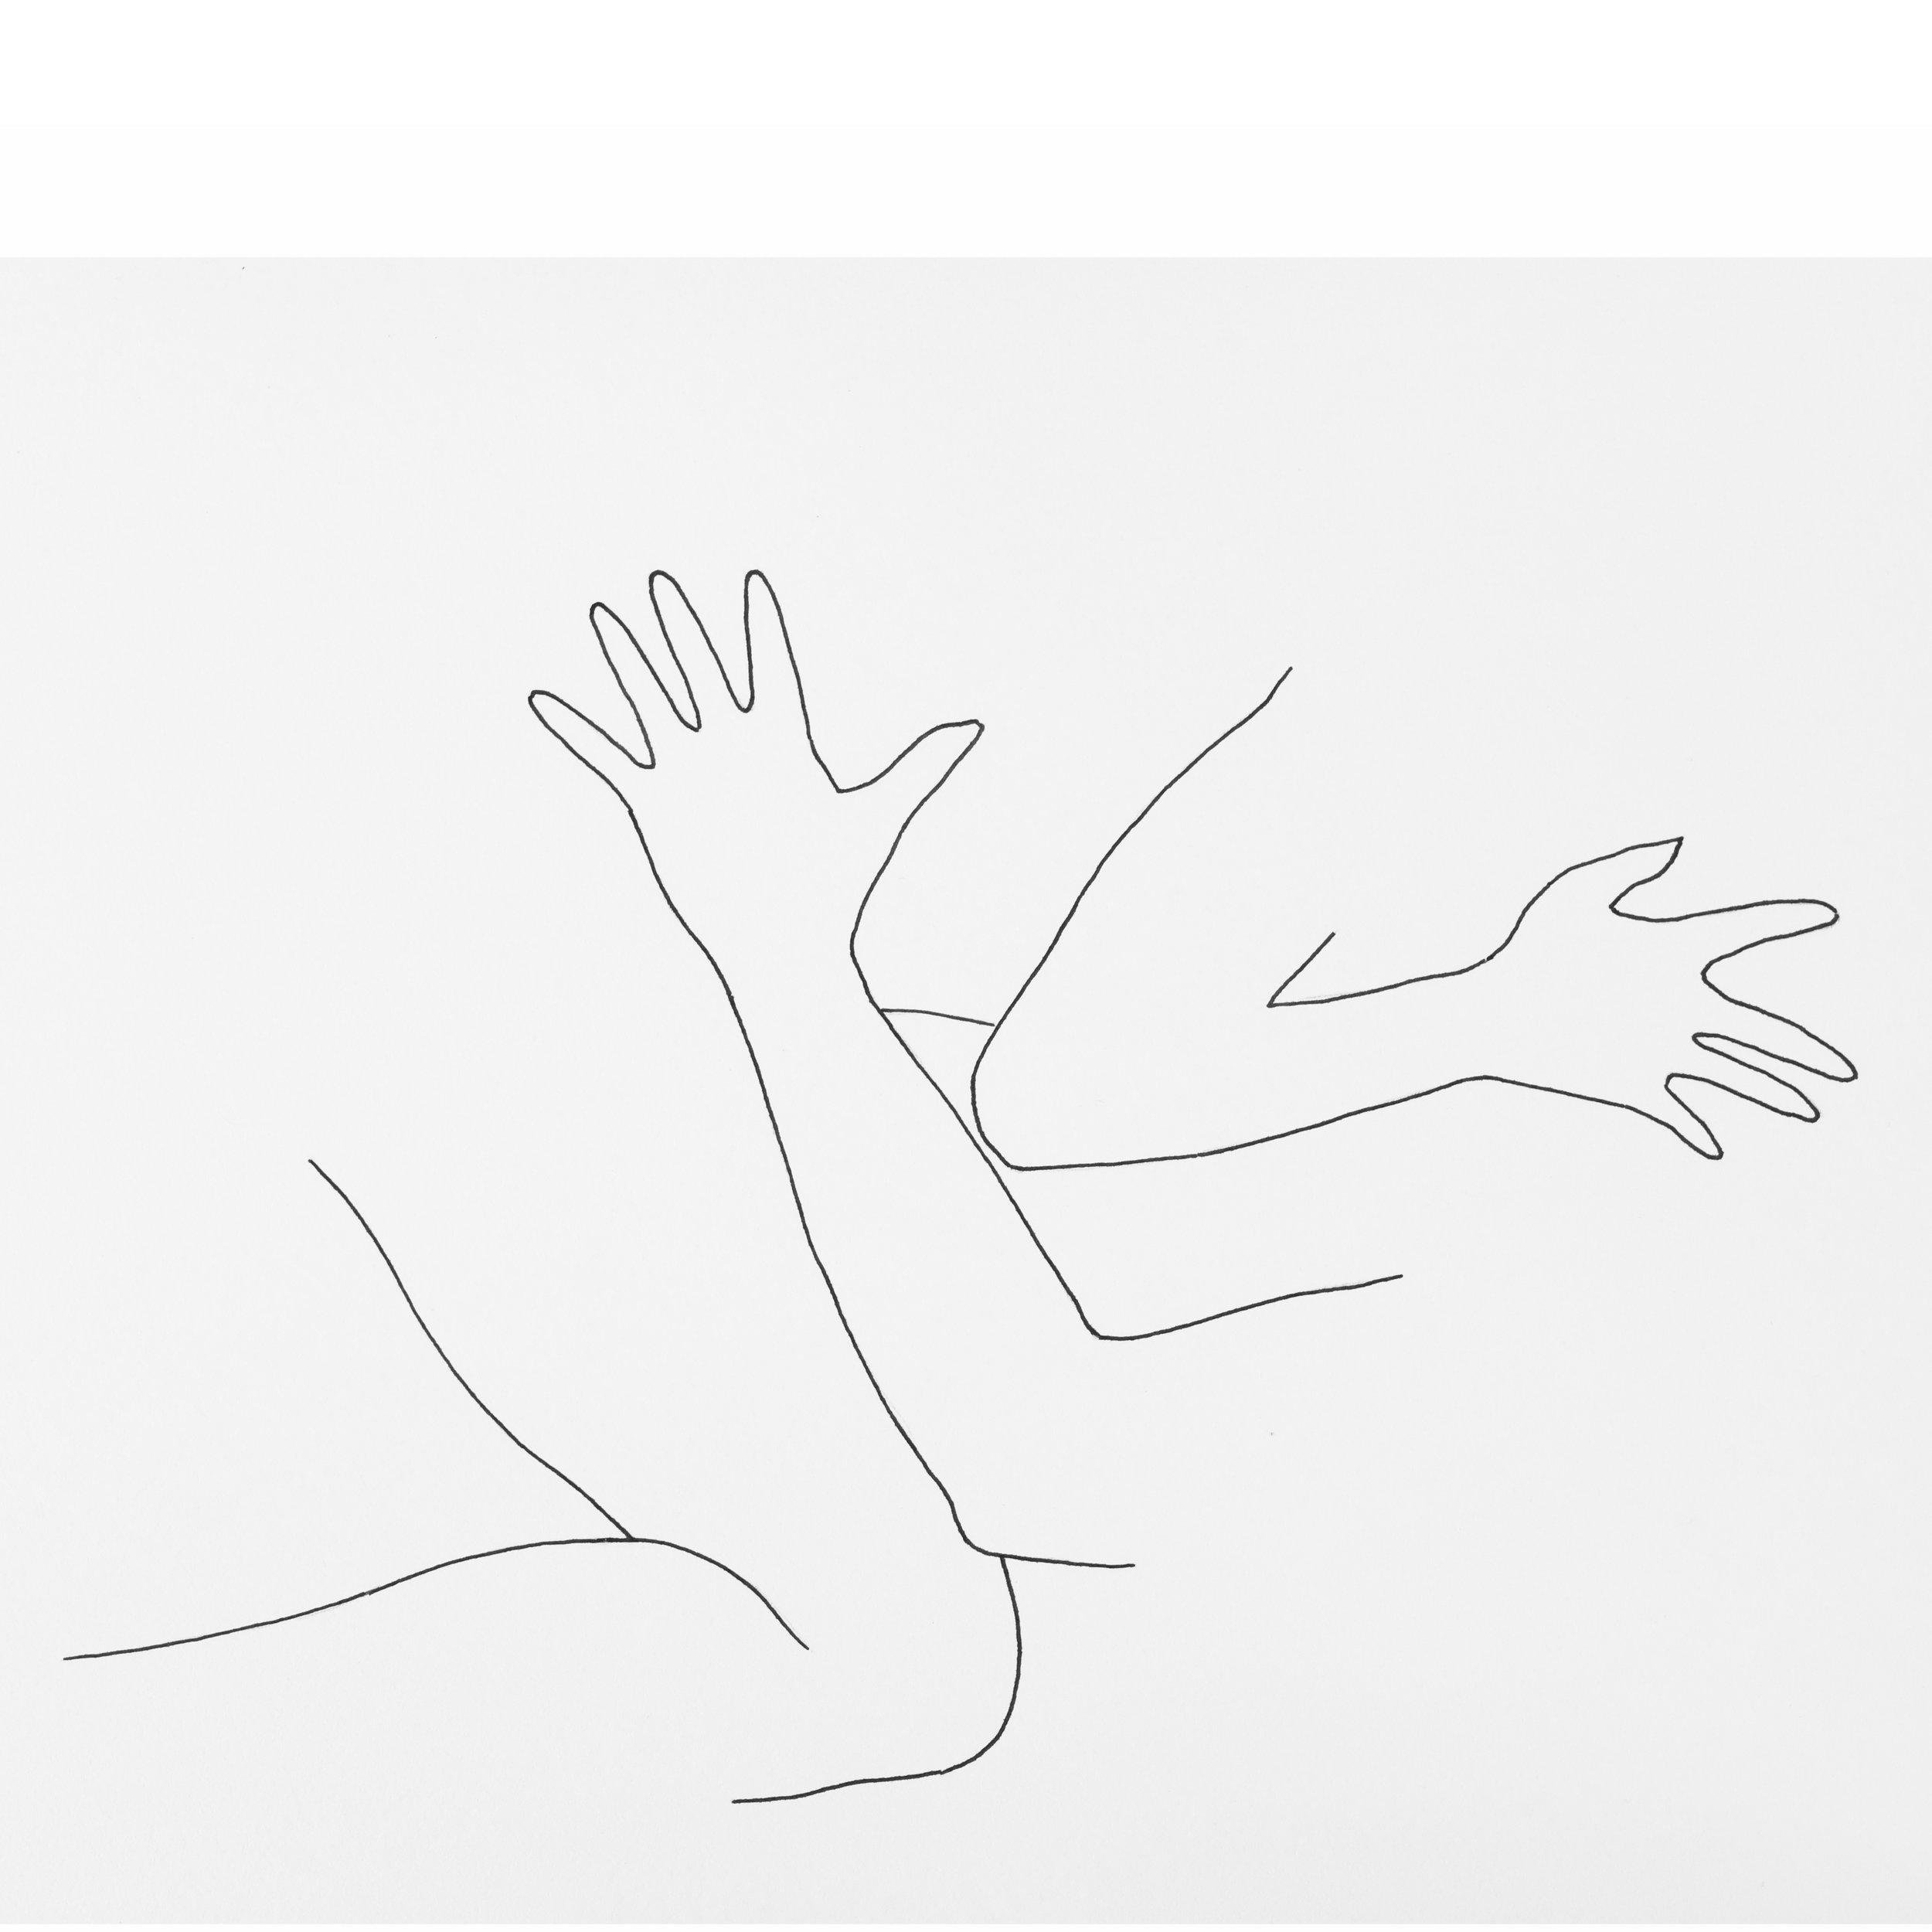 Minimal brush pen line drawing of two women.